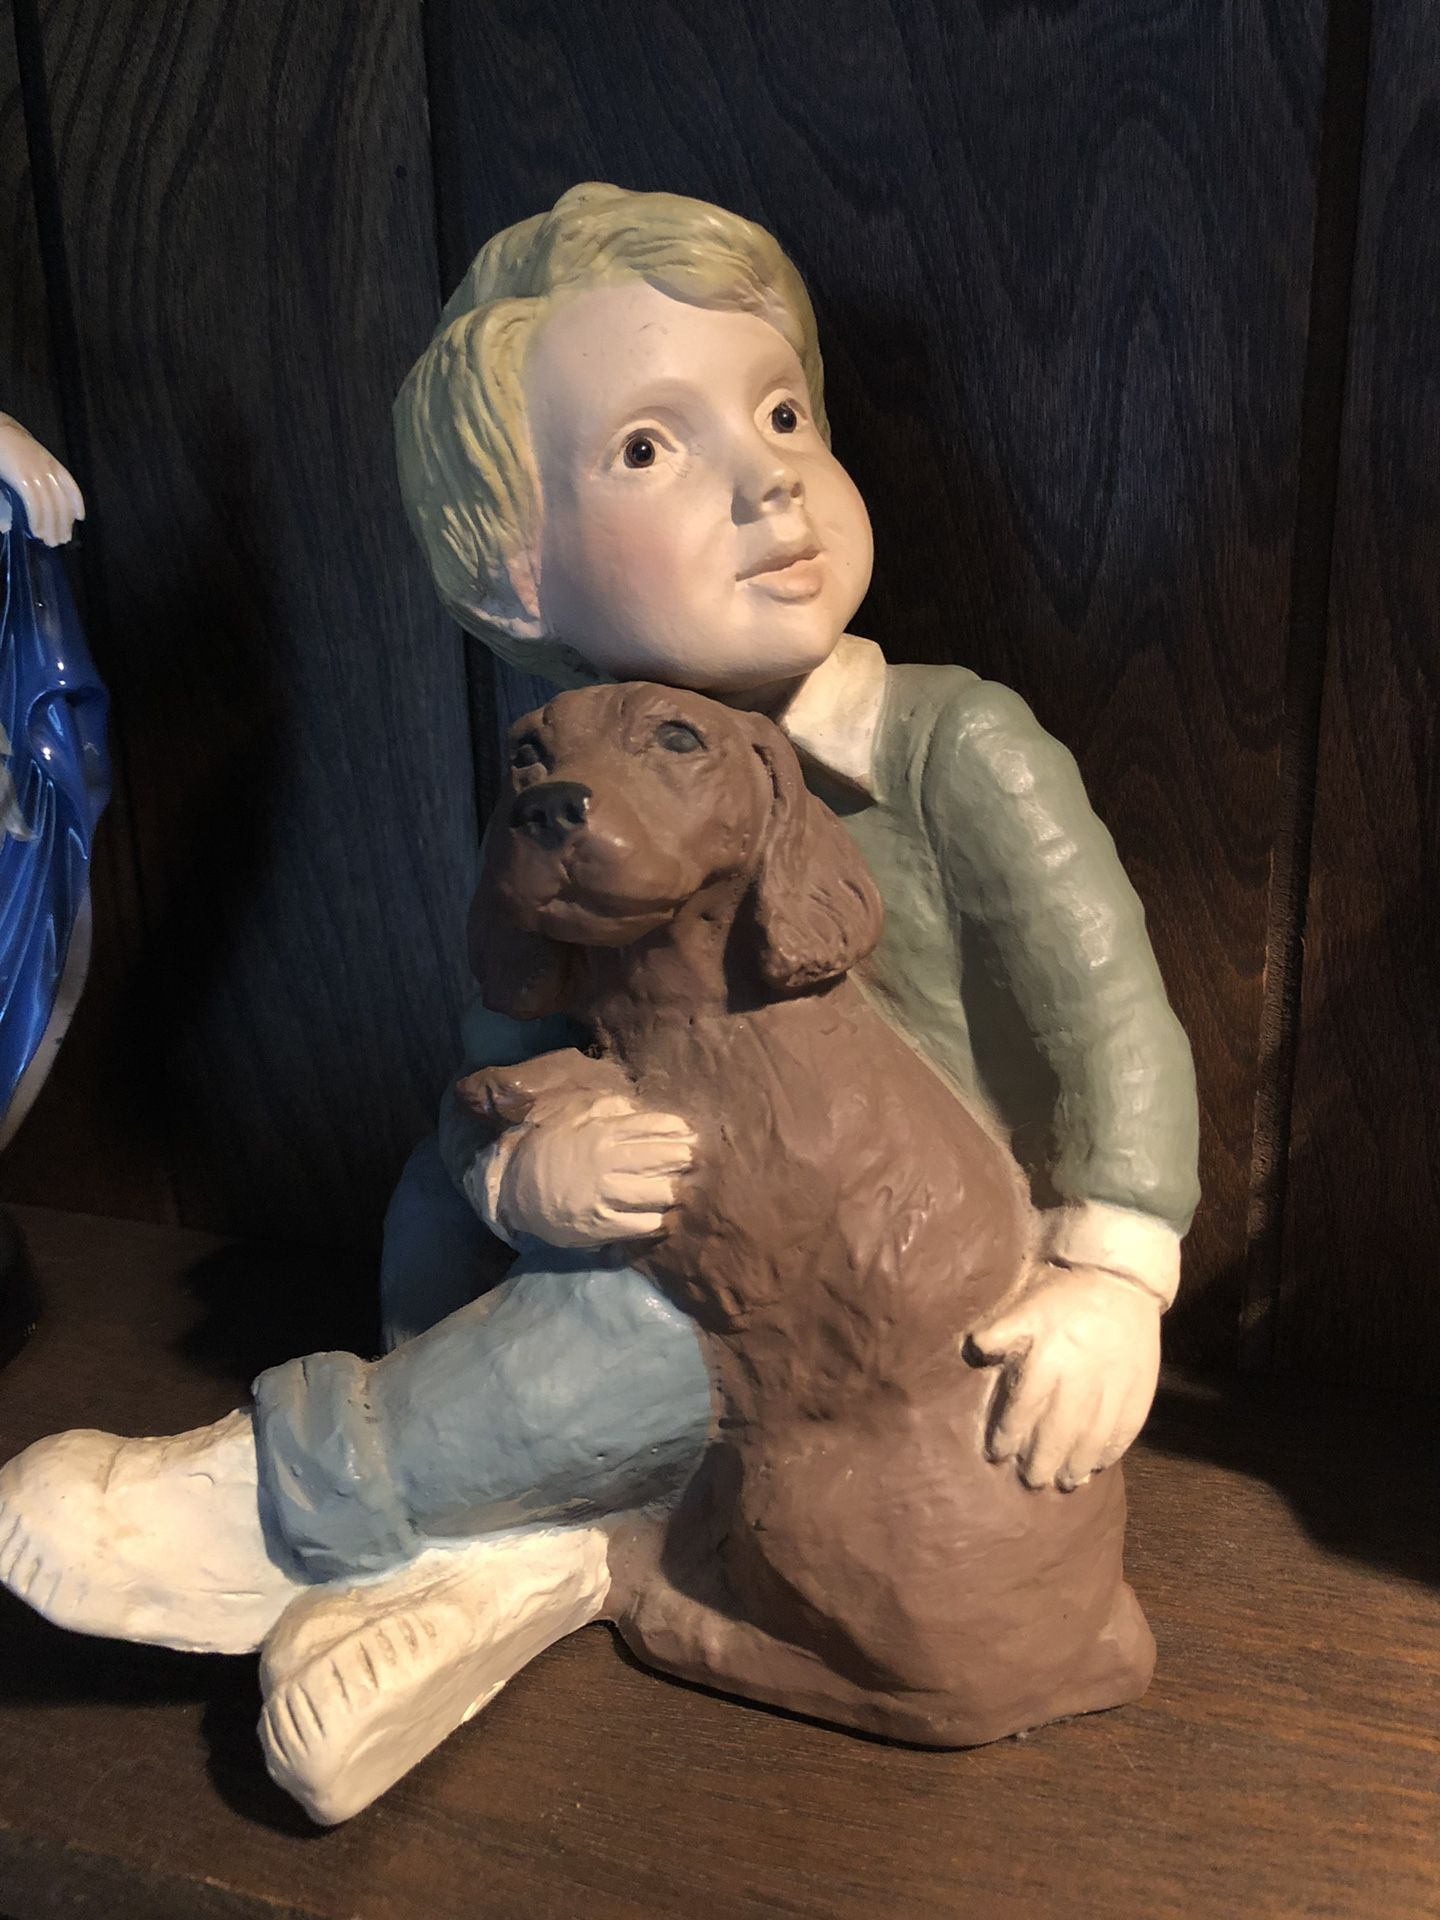 Boy with dog statue figurine